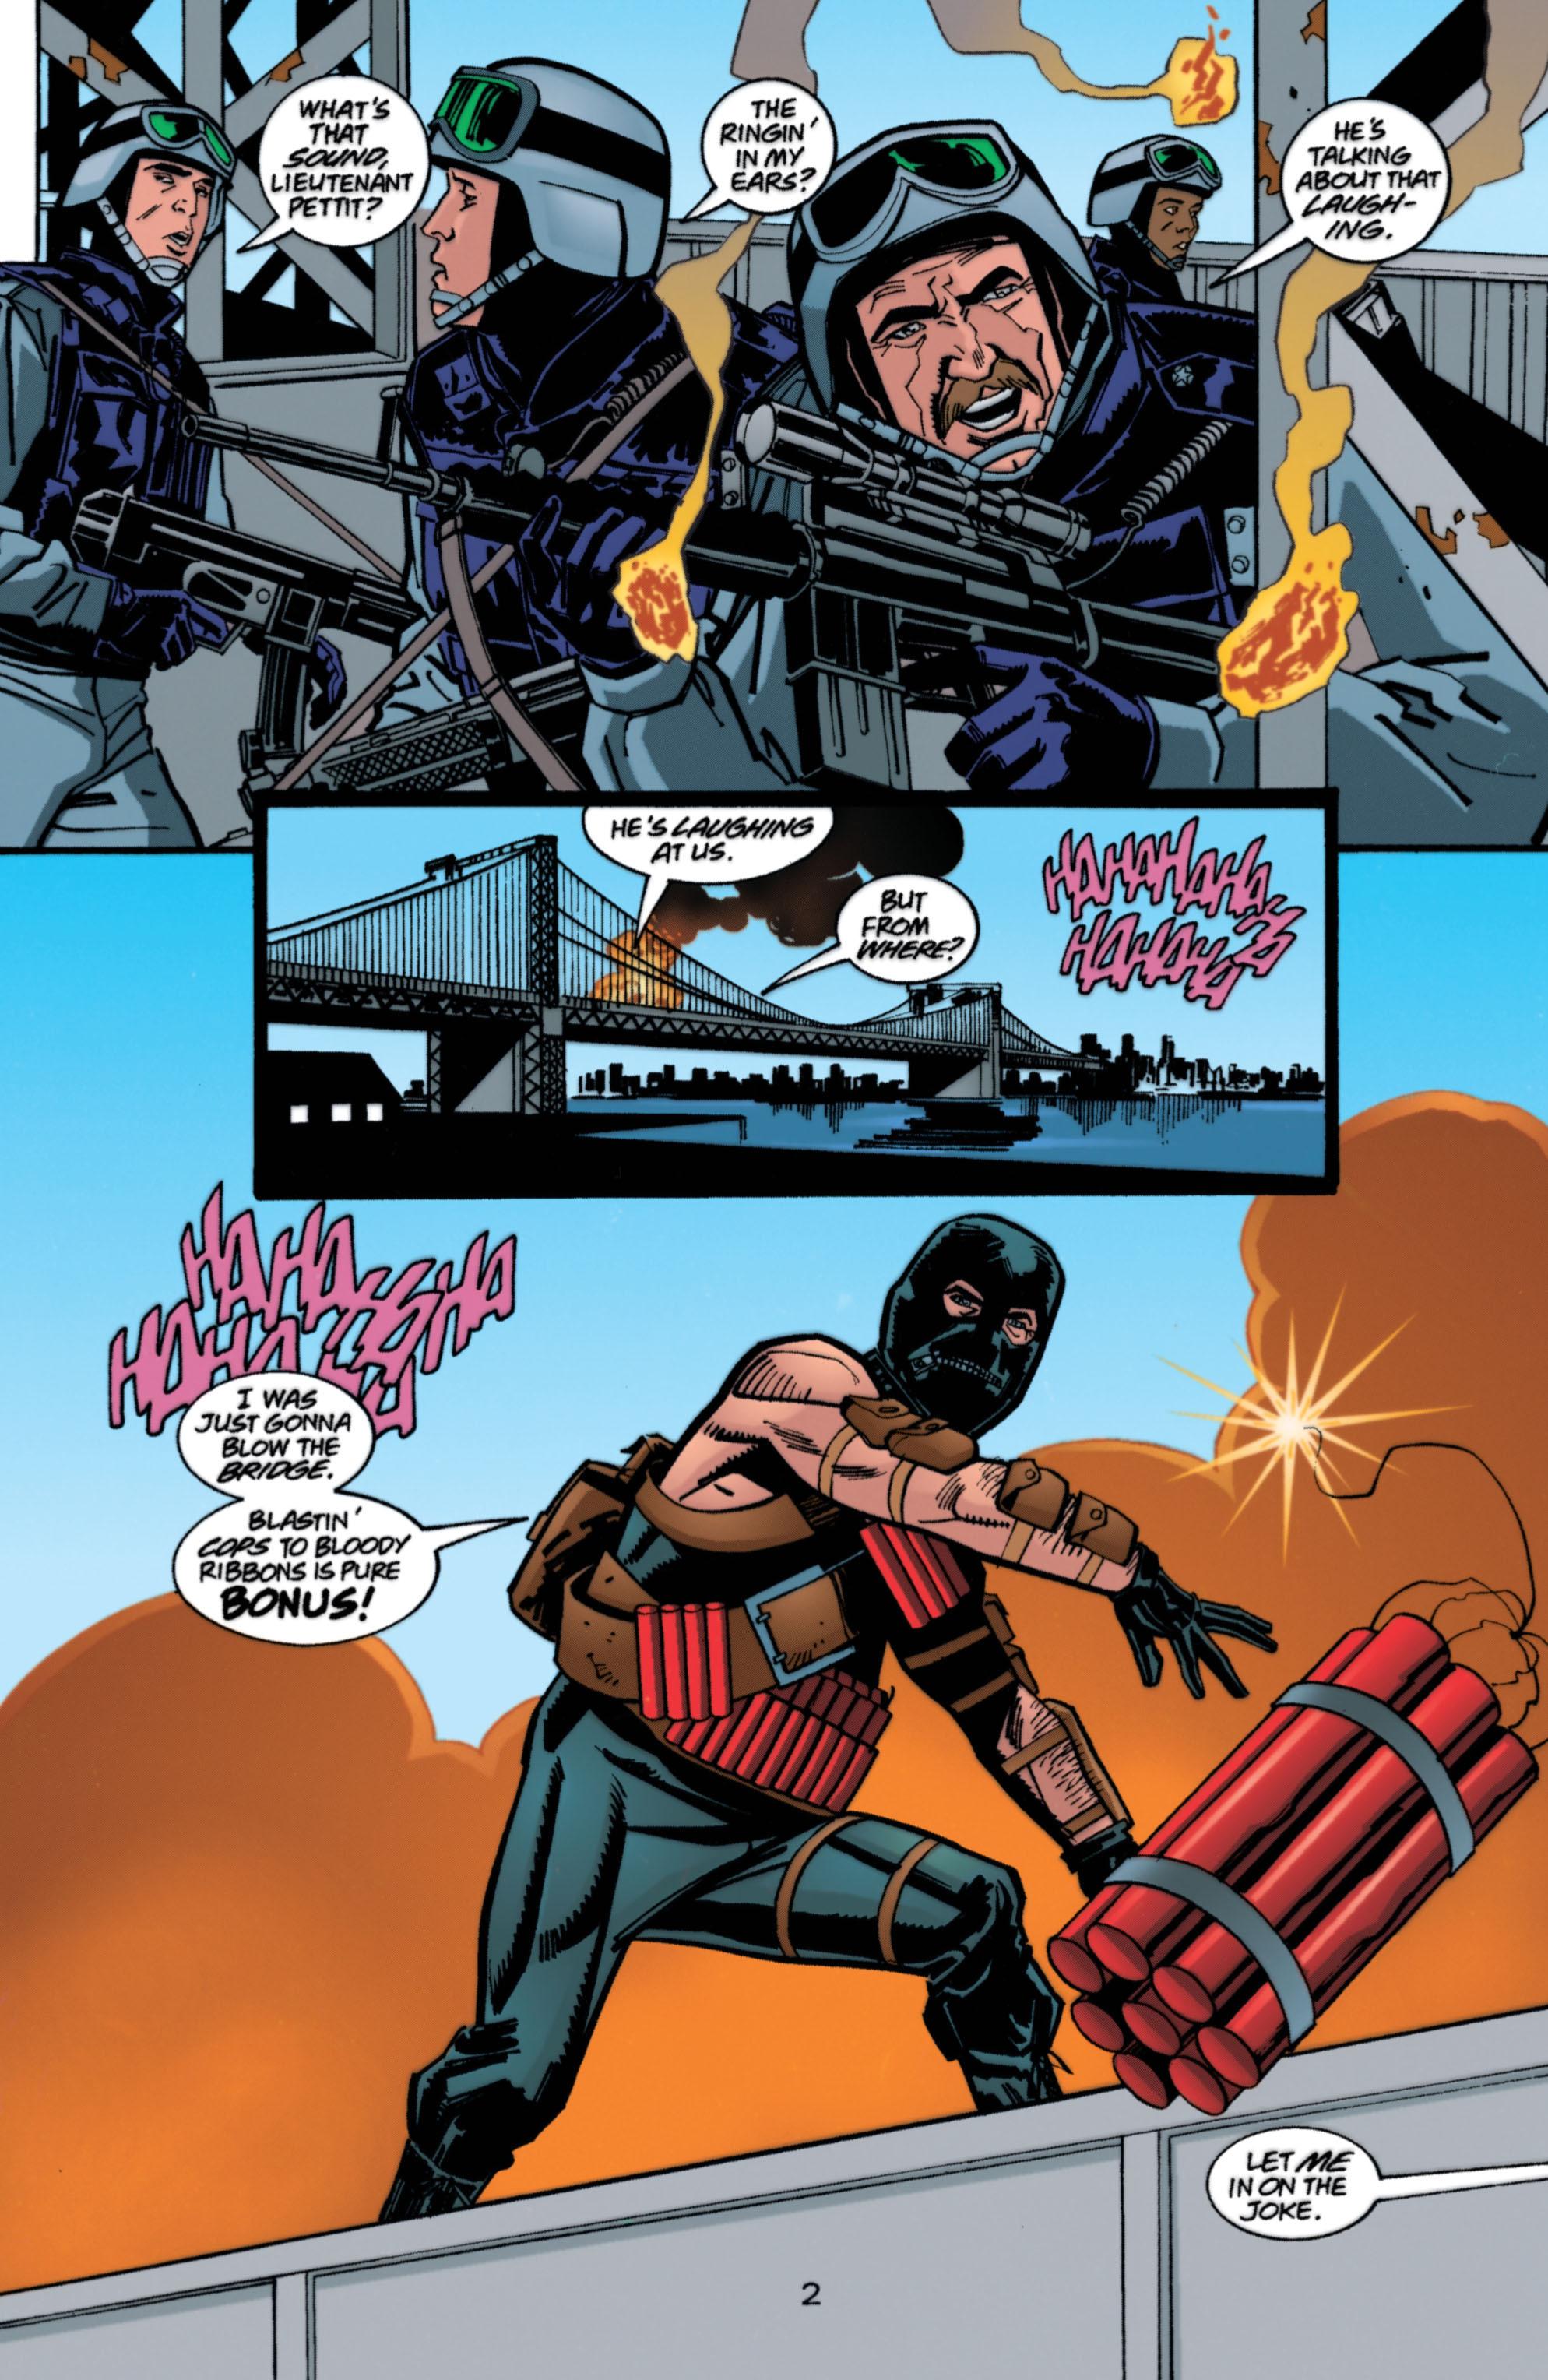 Detective Comics (1937) 728 Page 2